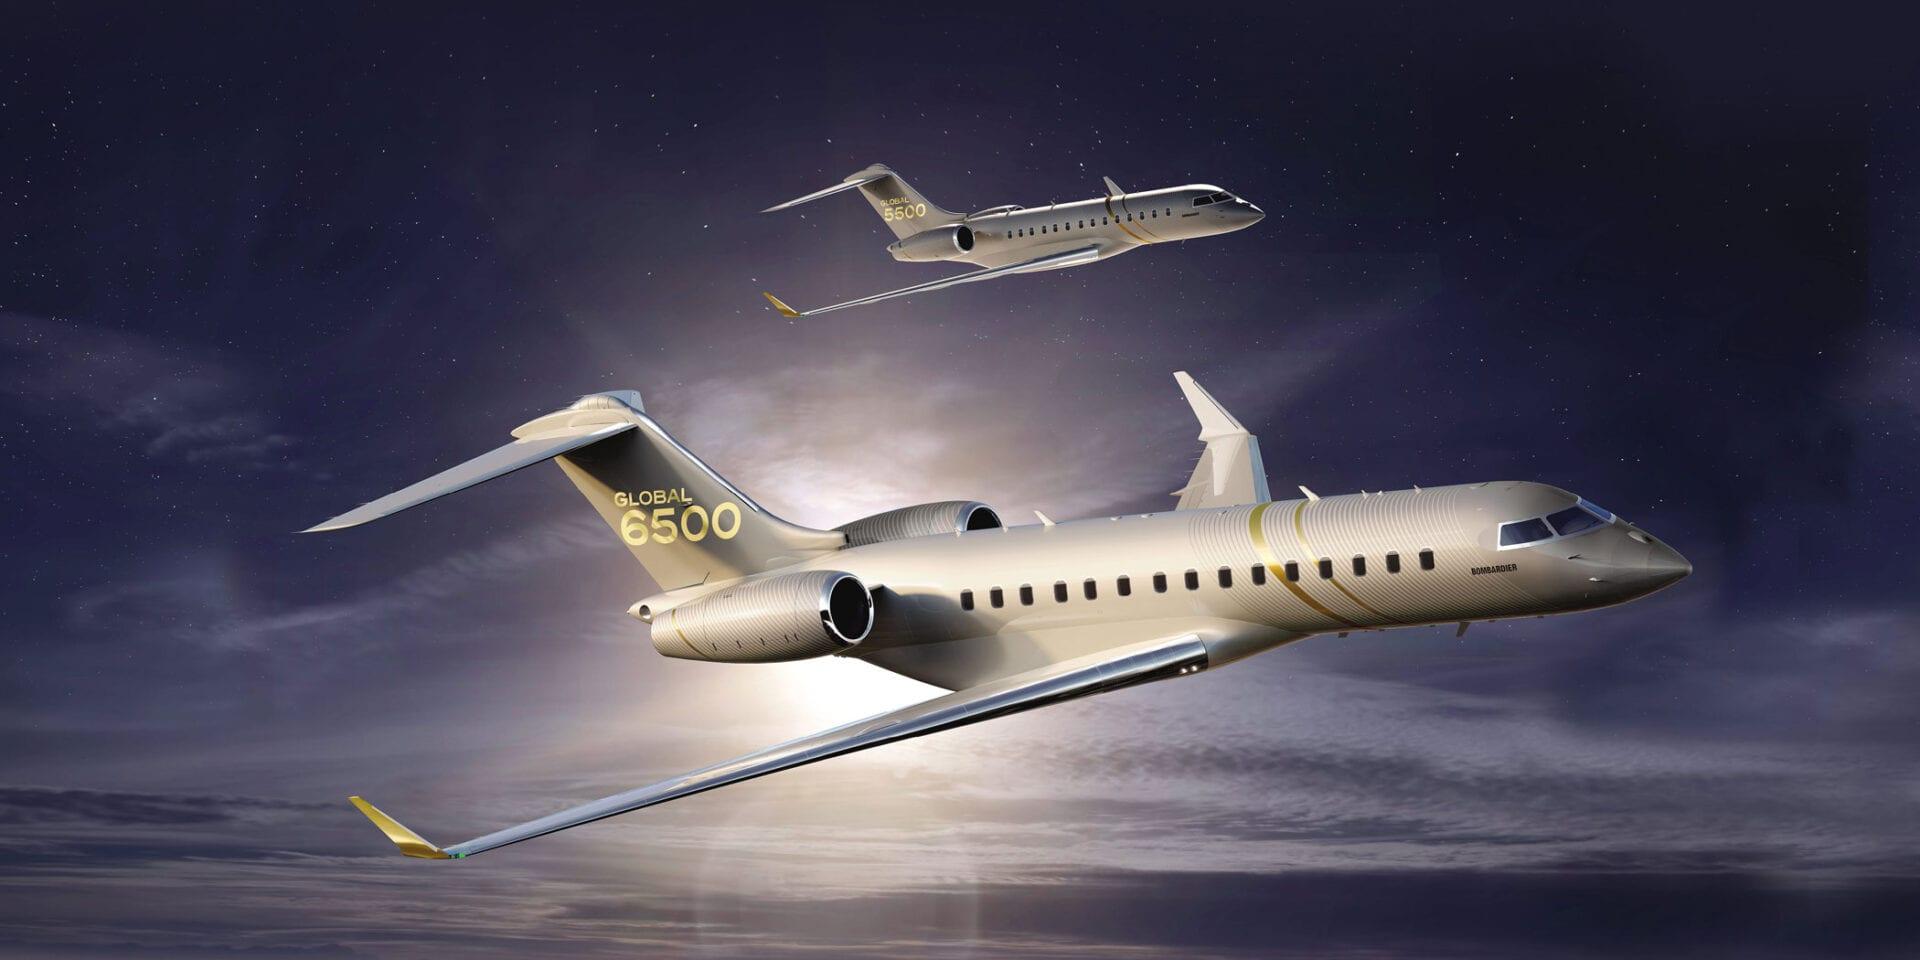 To νέο Bombardier Aviation Global 6500